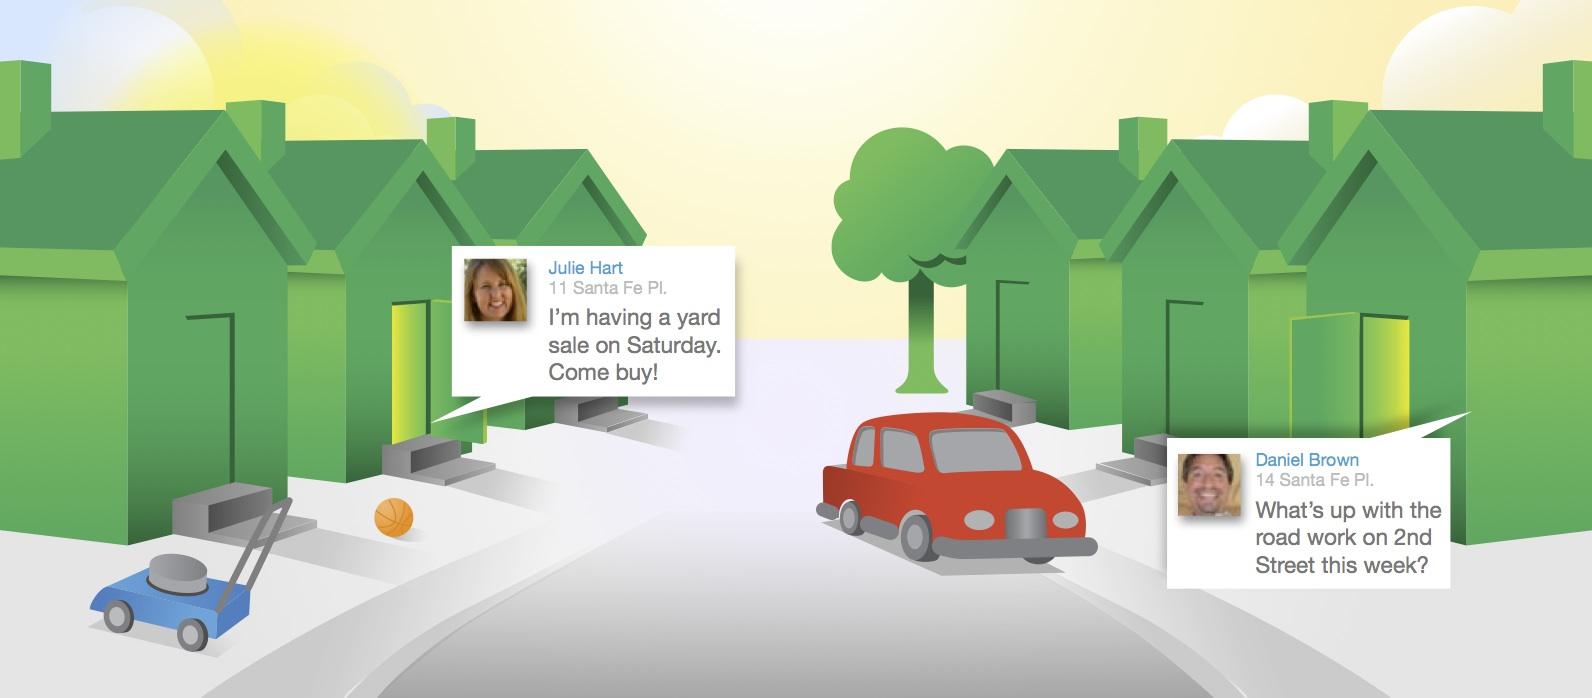 Charming Illustration Of Nextdoor Chat Session